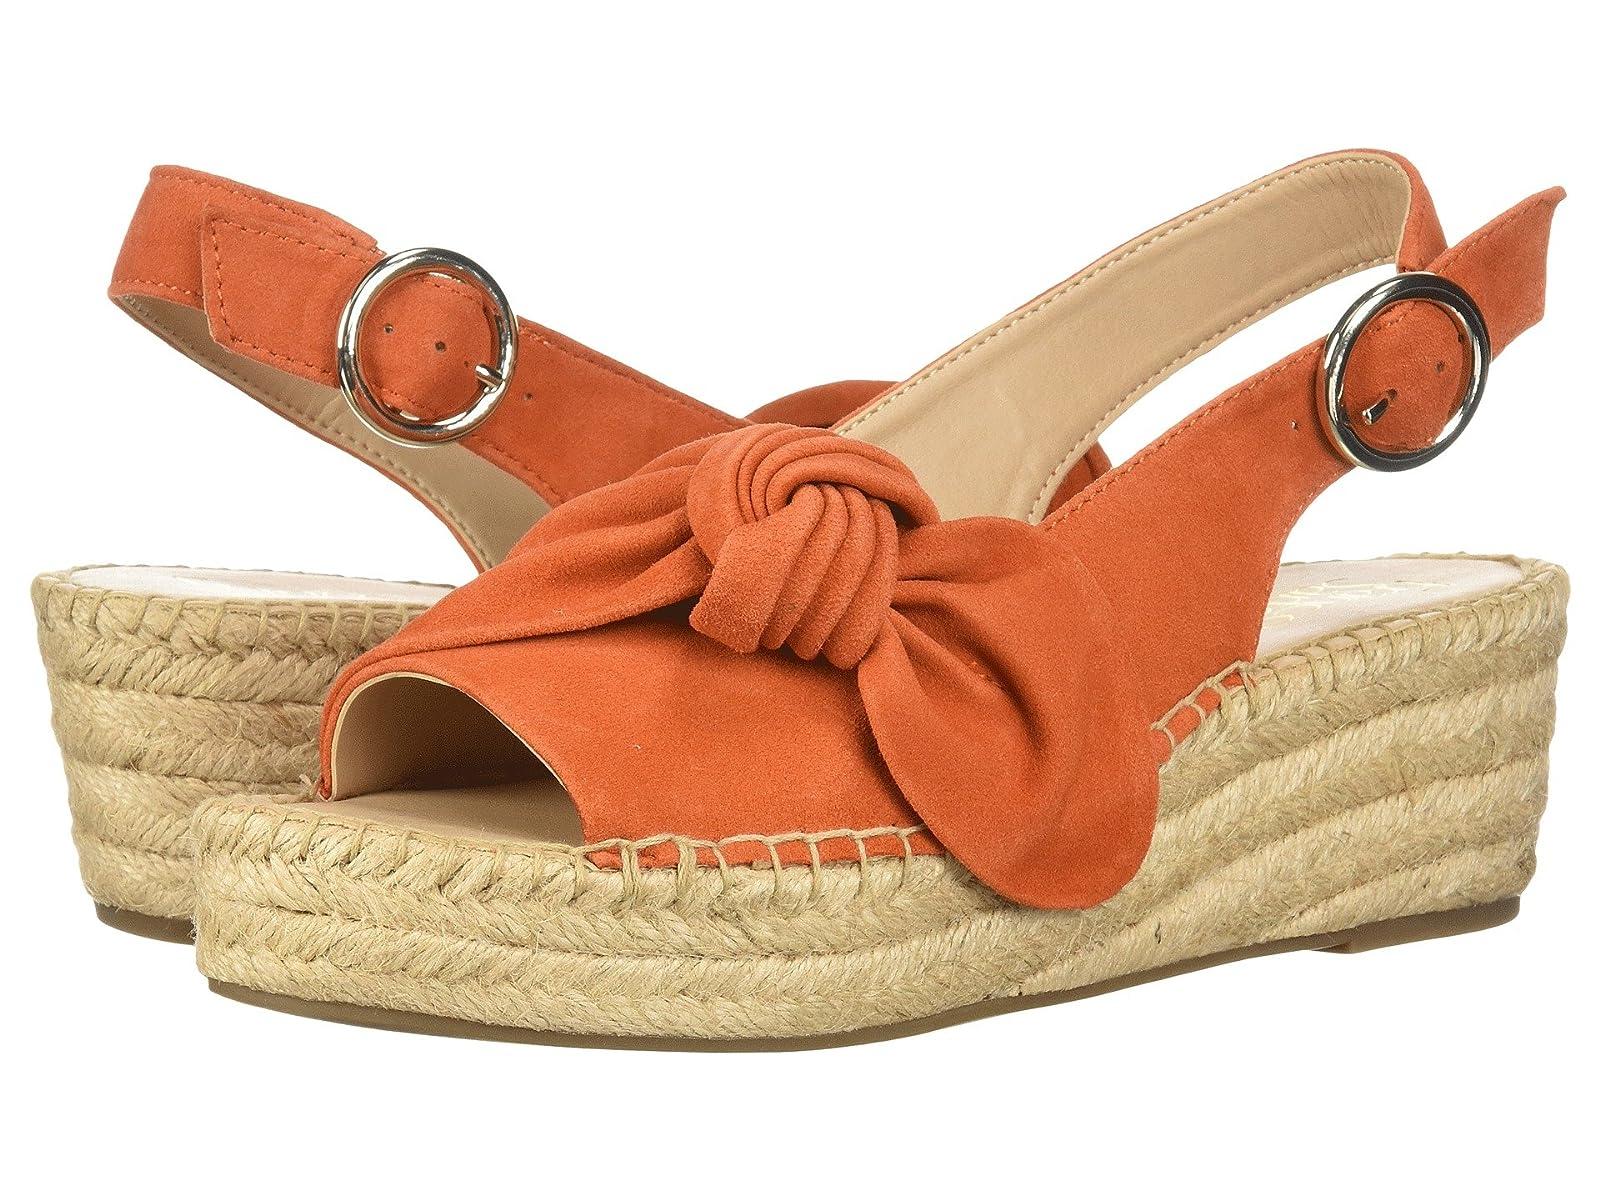 Franco Sarto PiroetteAtmospheric grades have affordable shoes